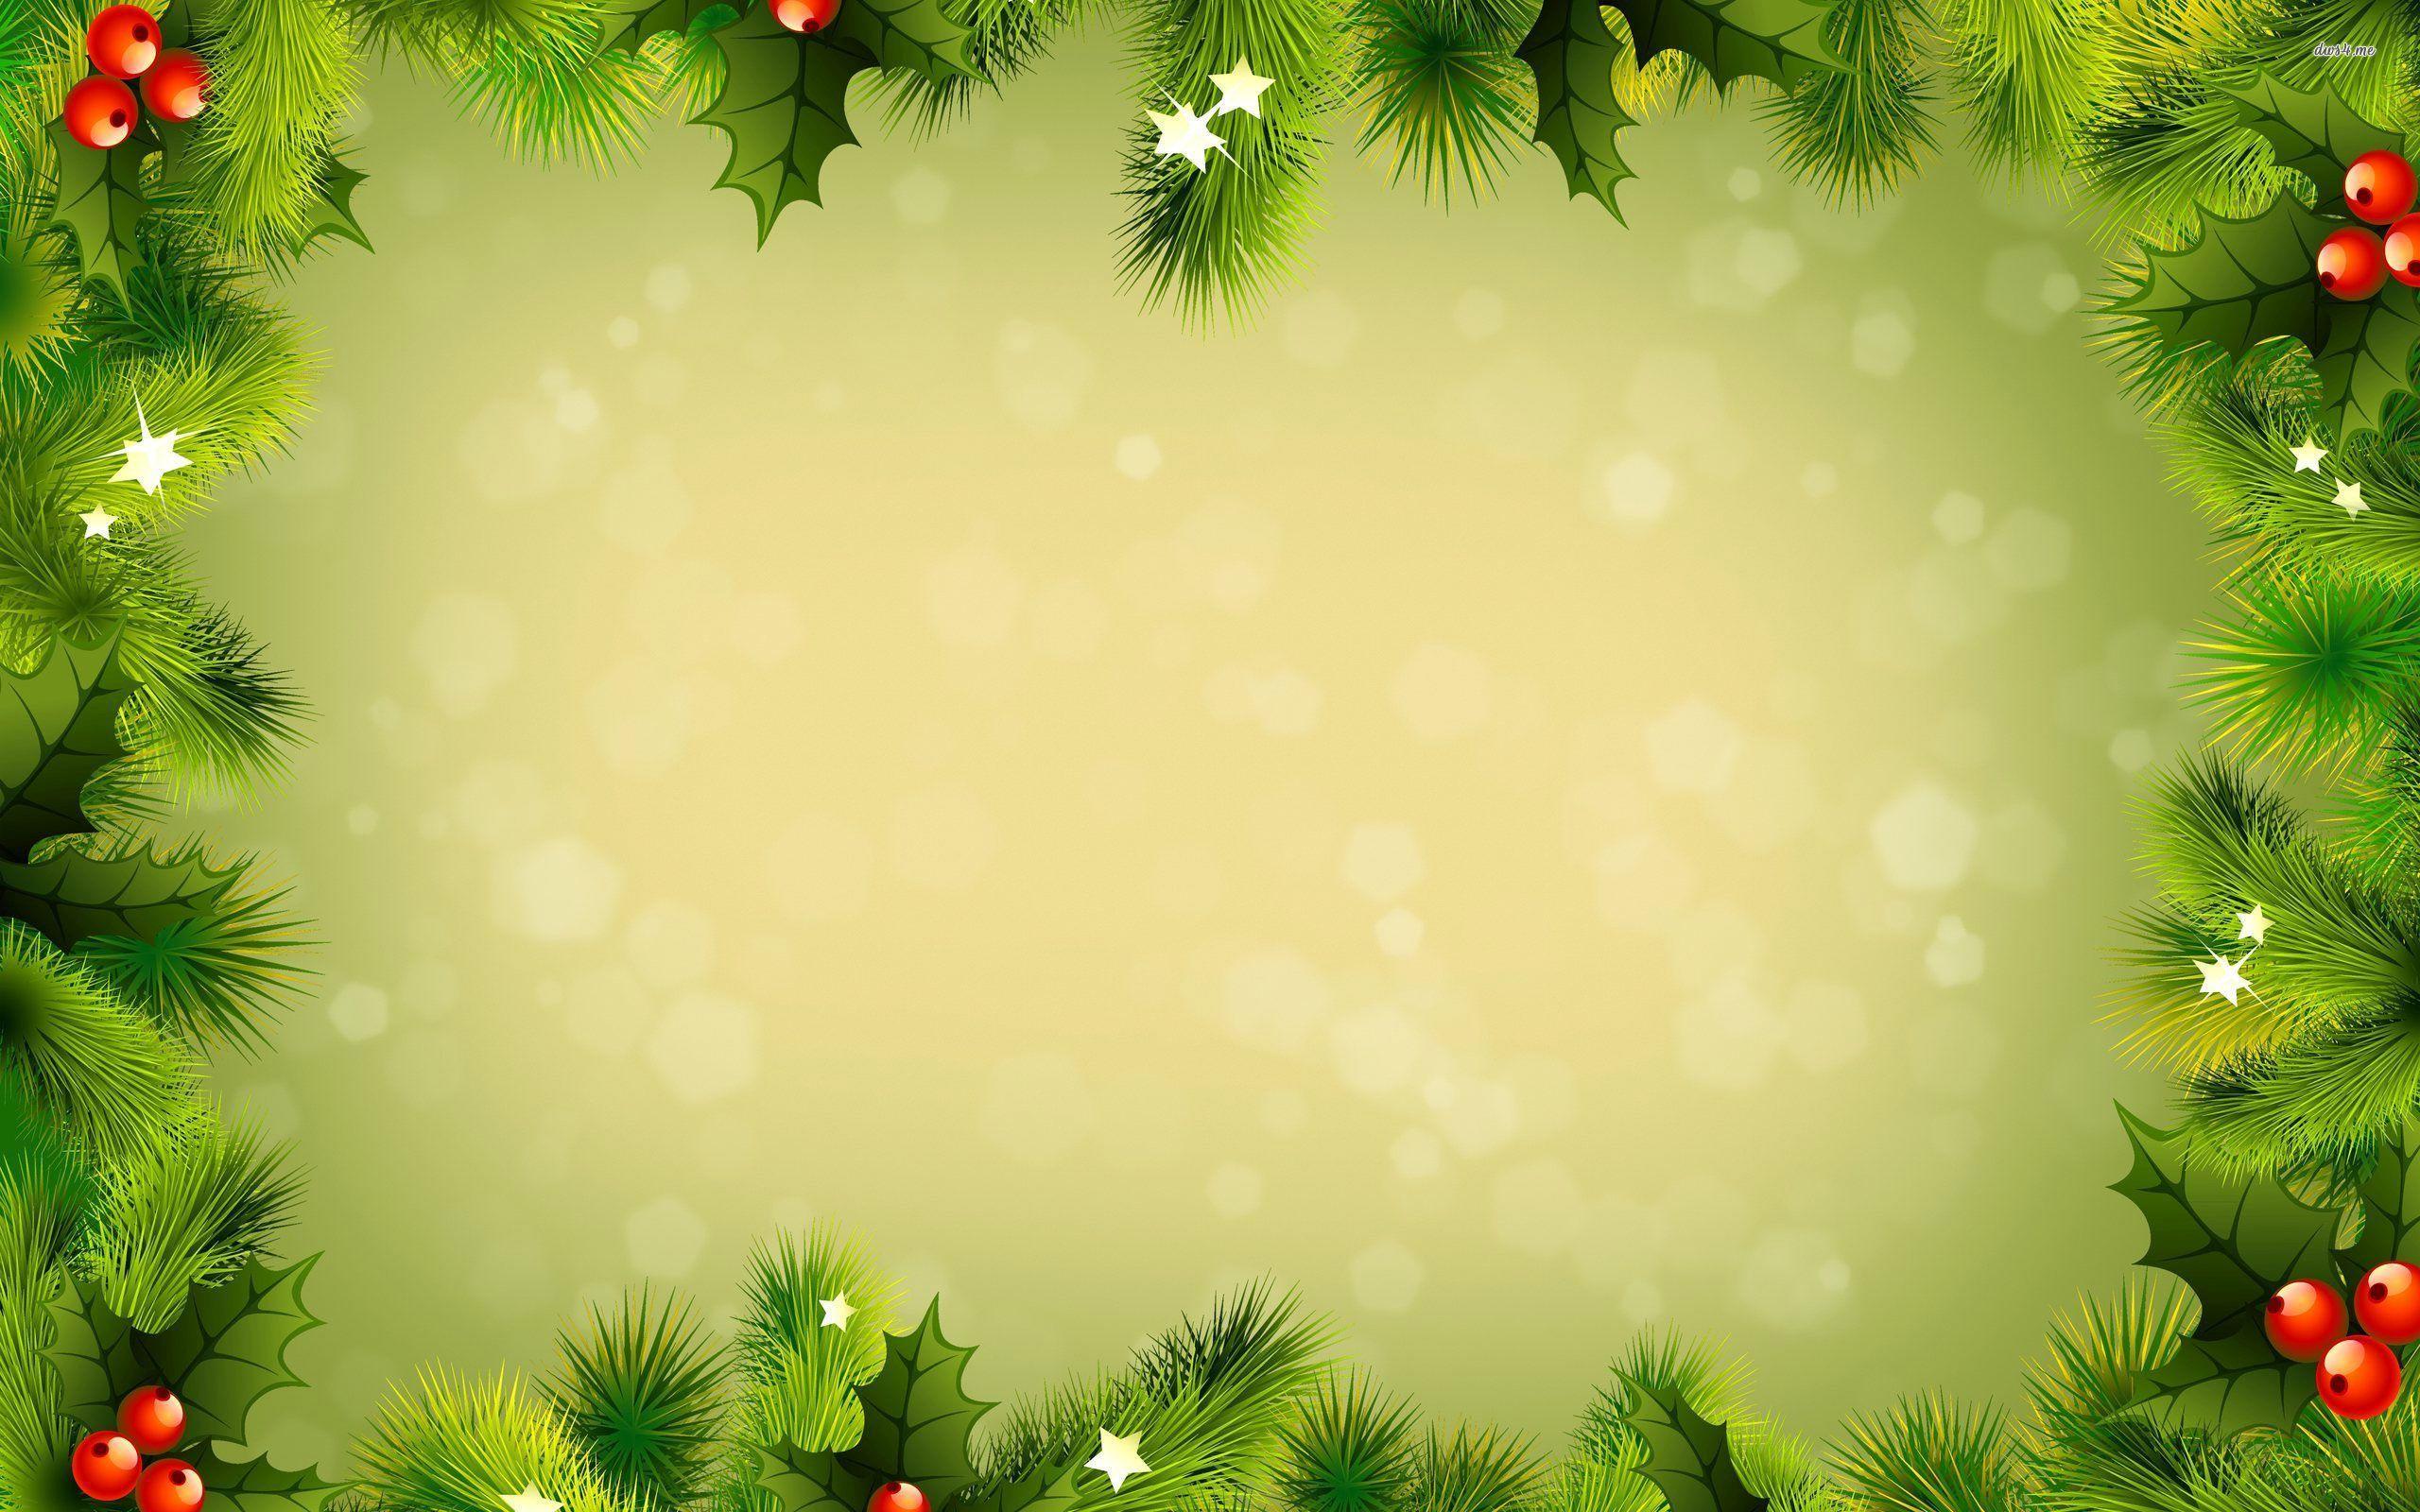 Christmas Wallpaper Christmas Wallpaper Hd Free Christmas Backgrounds Christmas Desktop Wallpaper